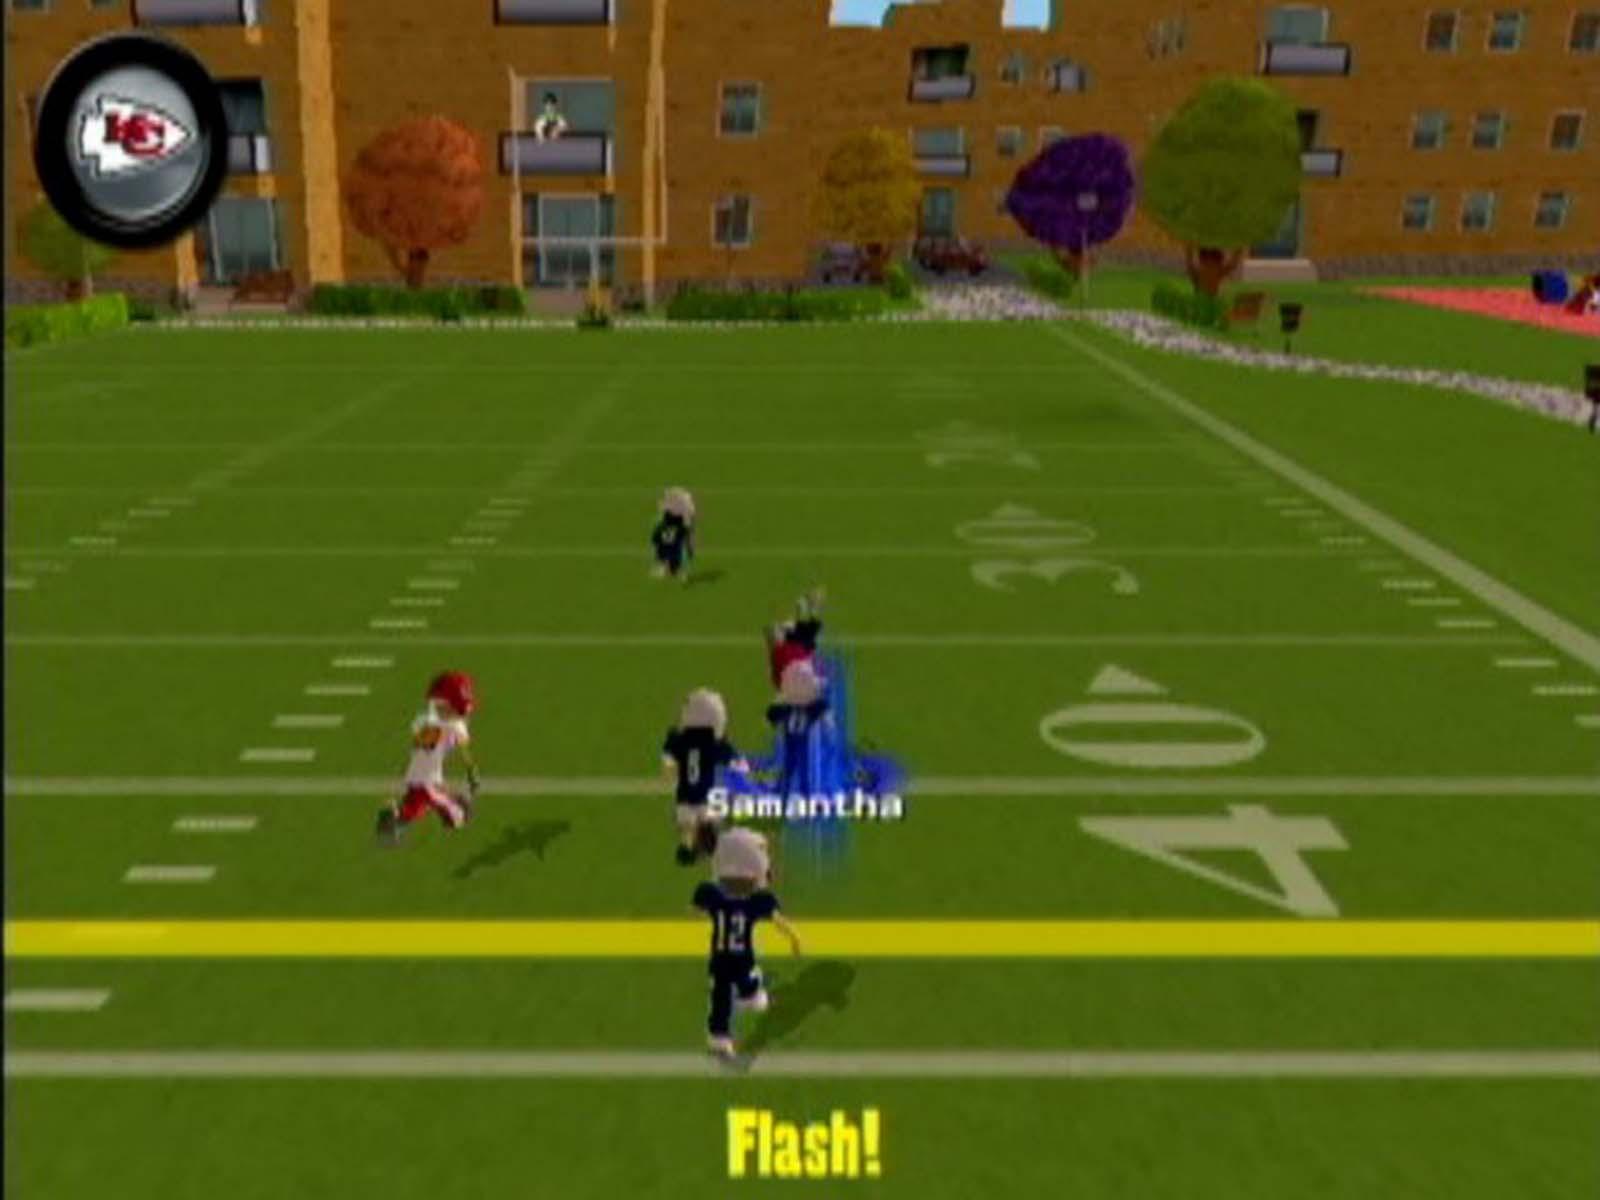 Download Backyard Football For Mac backyard football '09 (usa) iso < ps2 isos | emuparadise